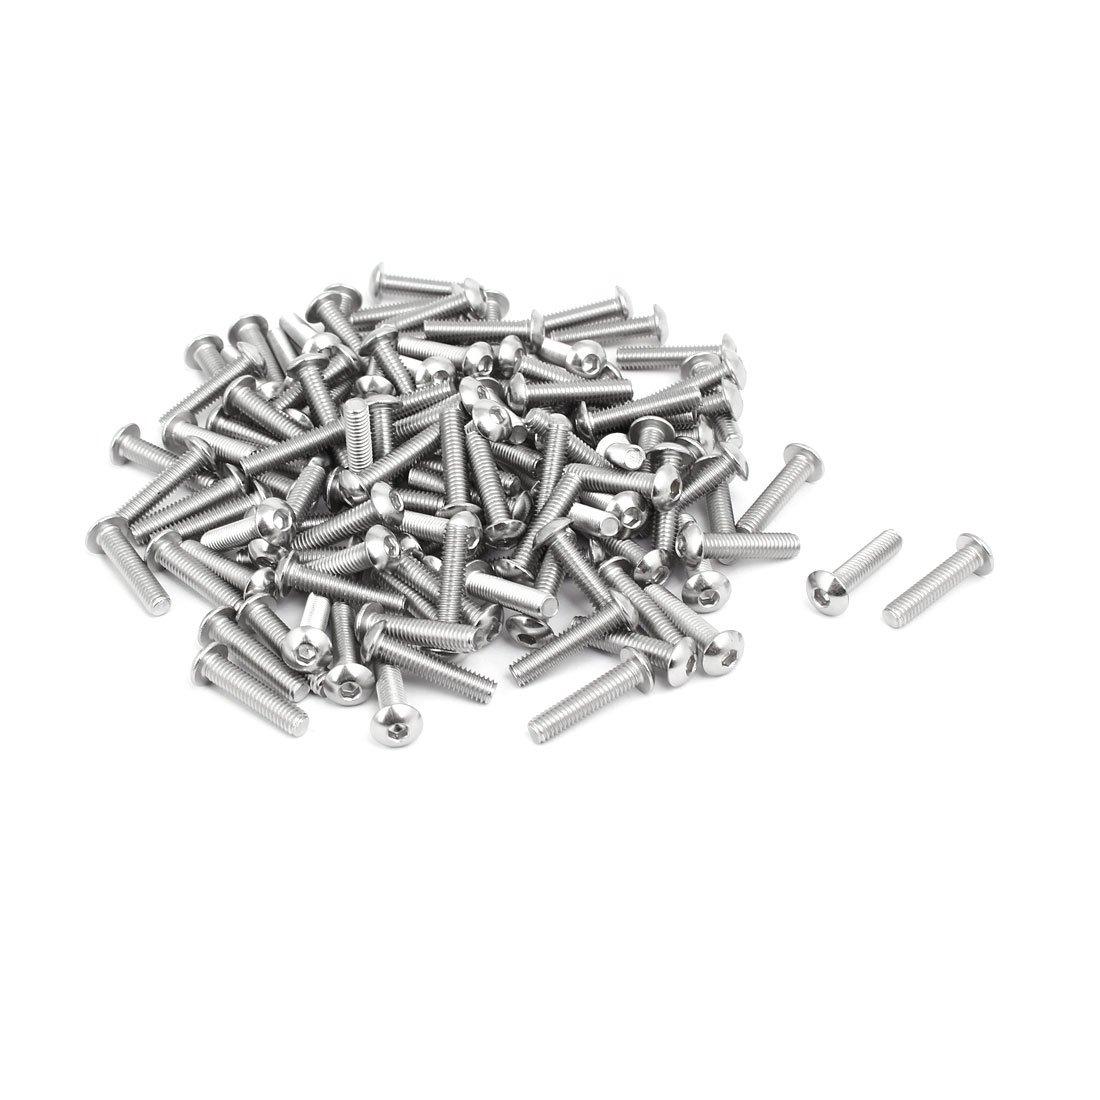 uxcell M4x18mm 304 Stainless Steel Button Head Hex Socket Cap Screws Bolts 120pcs